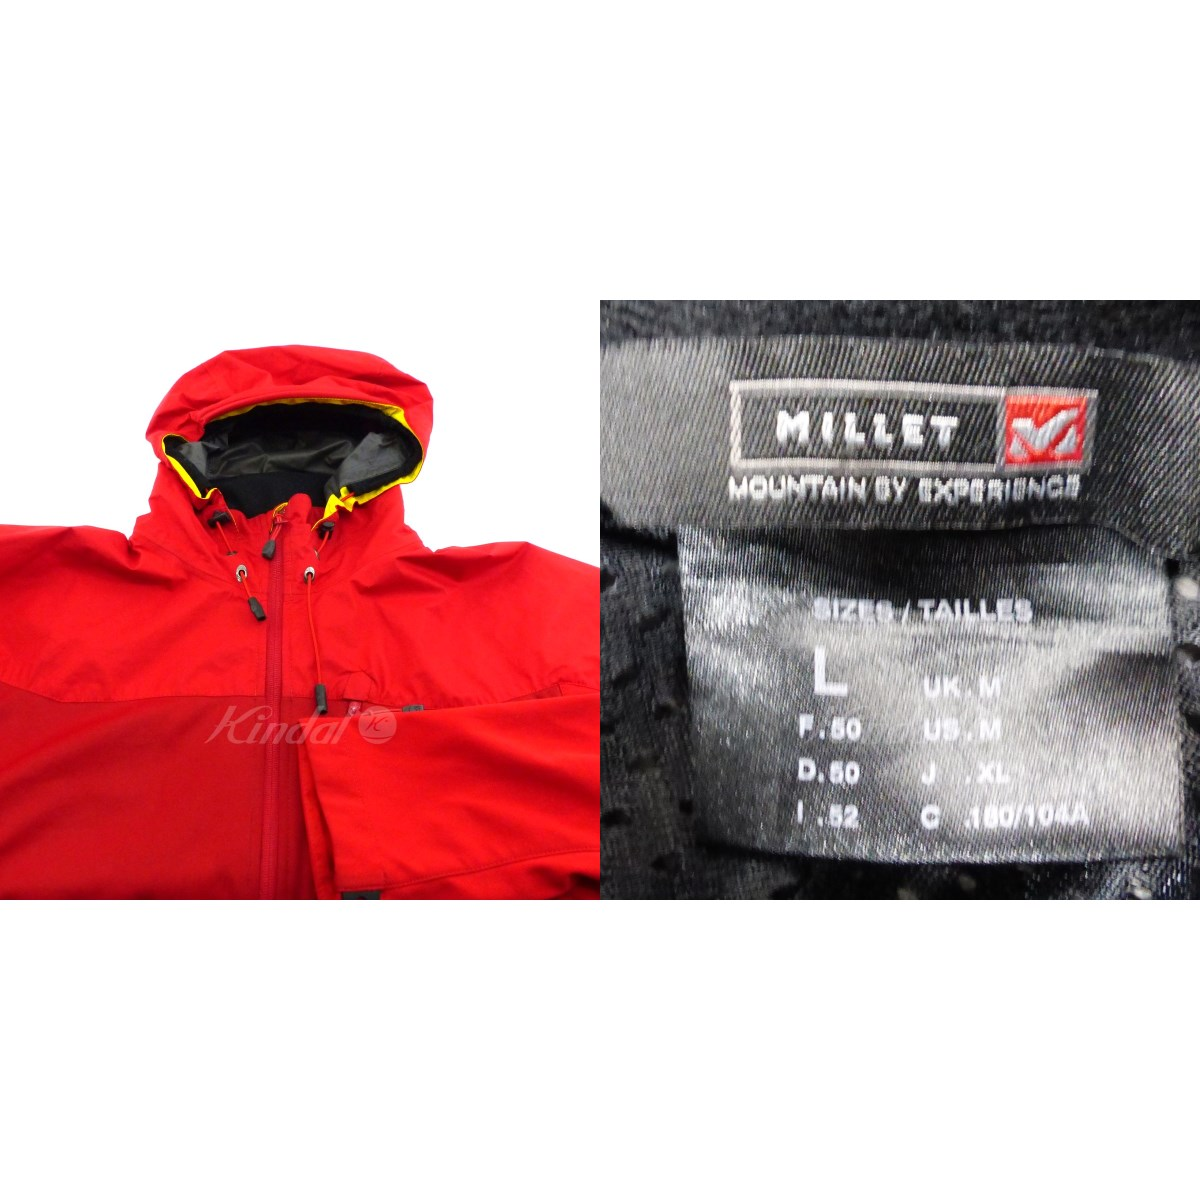 MILLET COMPOSITE JACKET レッド サイズ L030520ミレーE9W2IDH